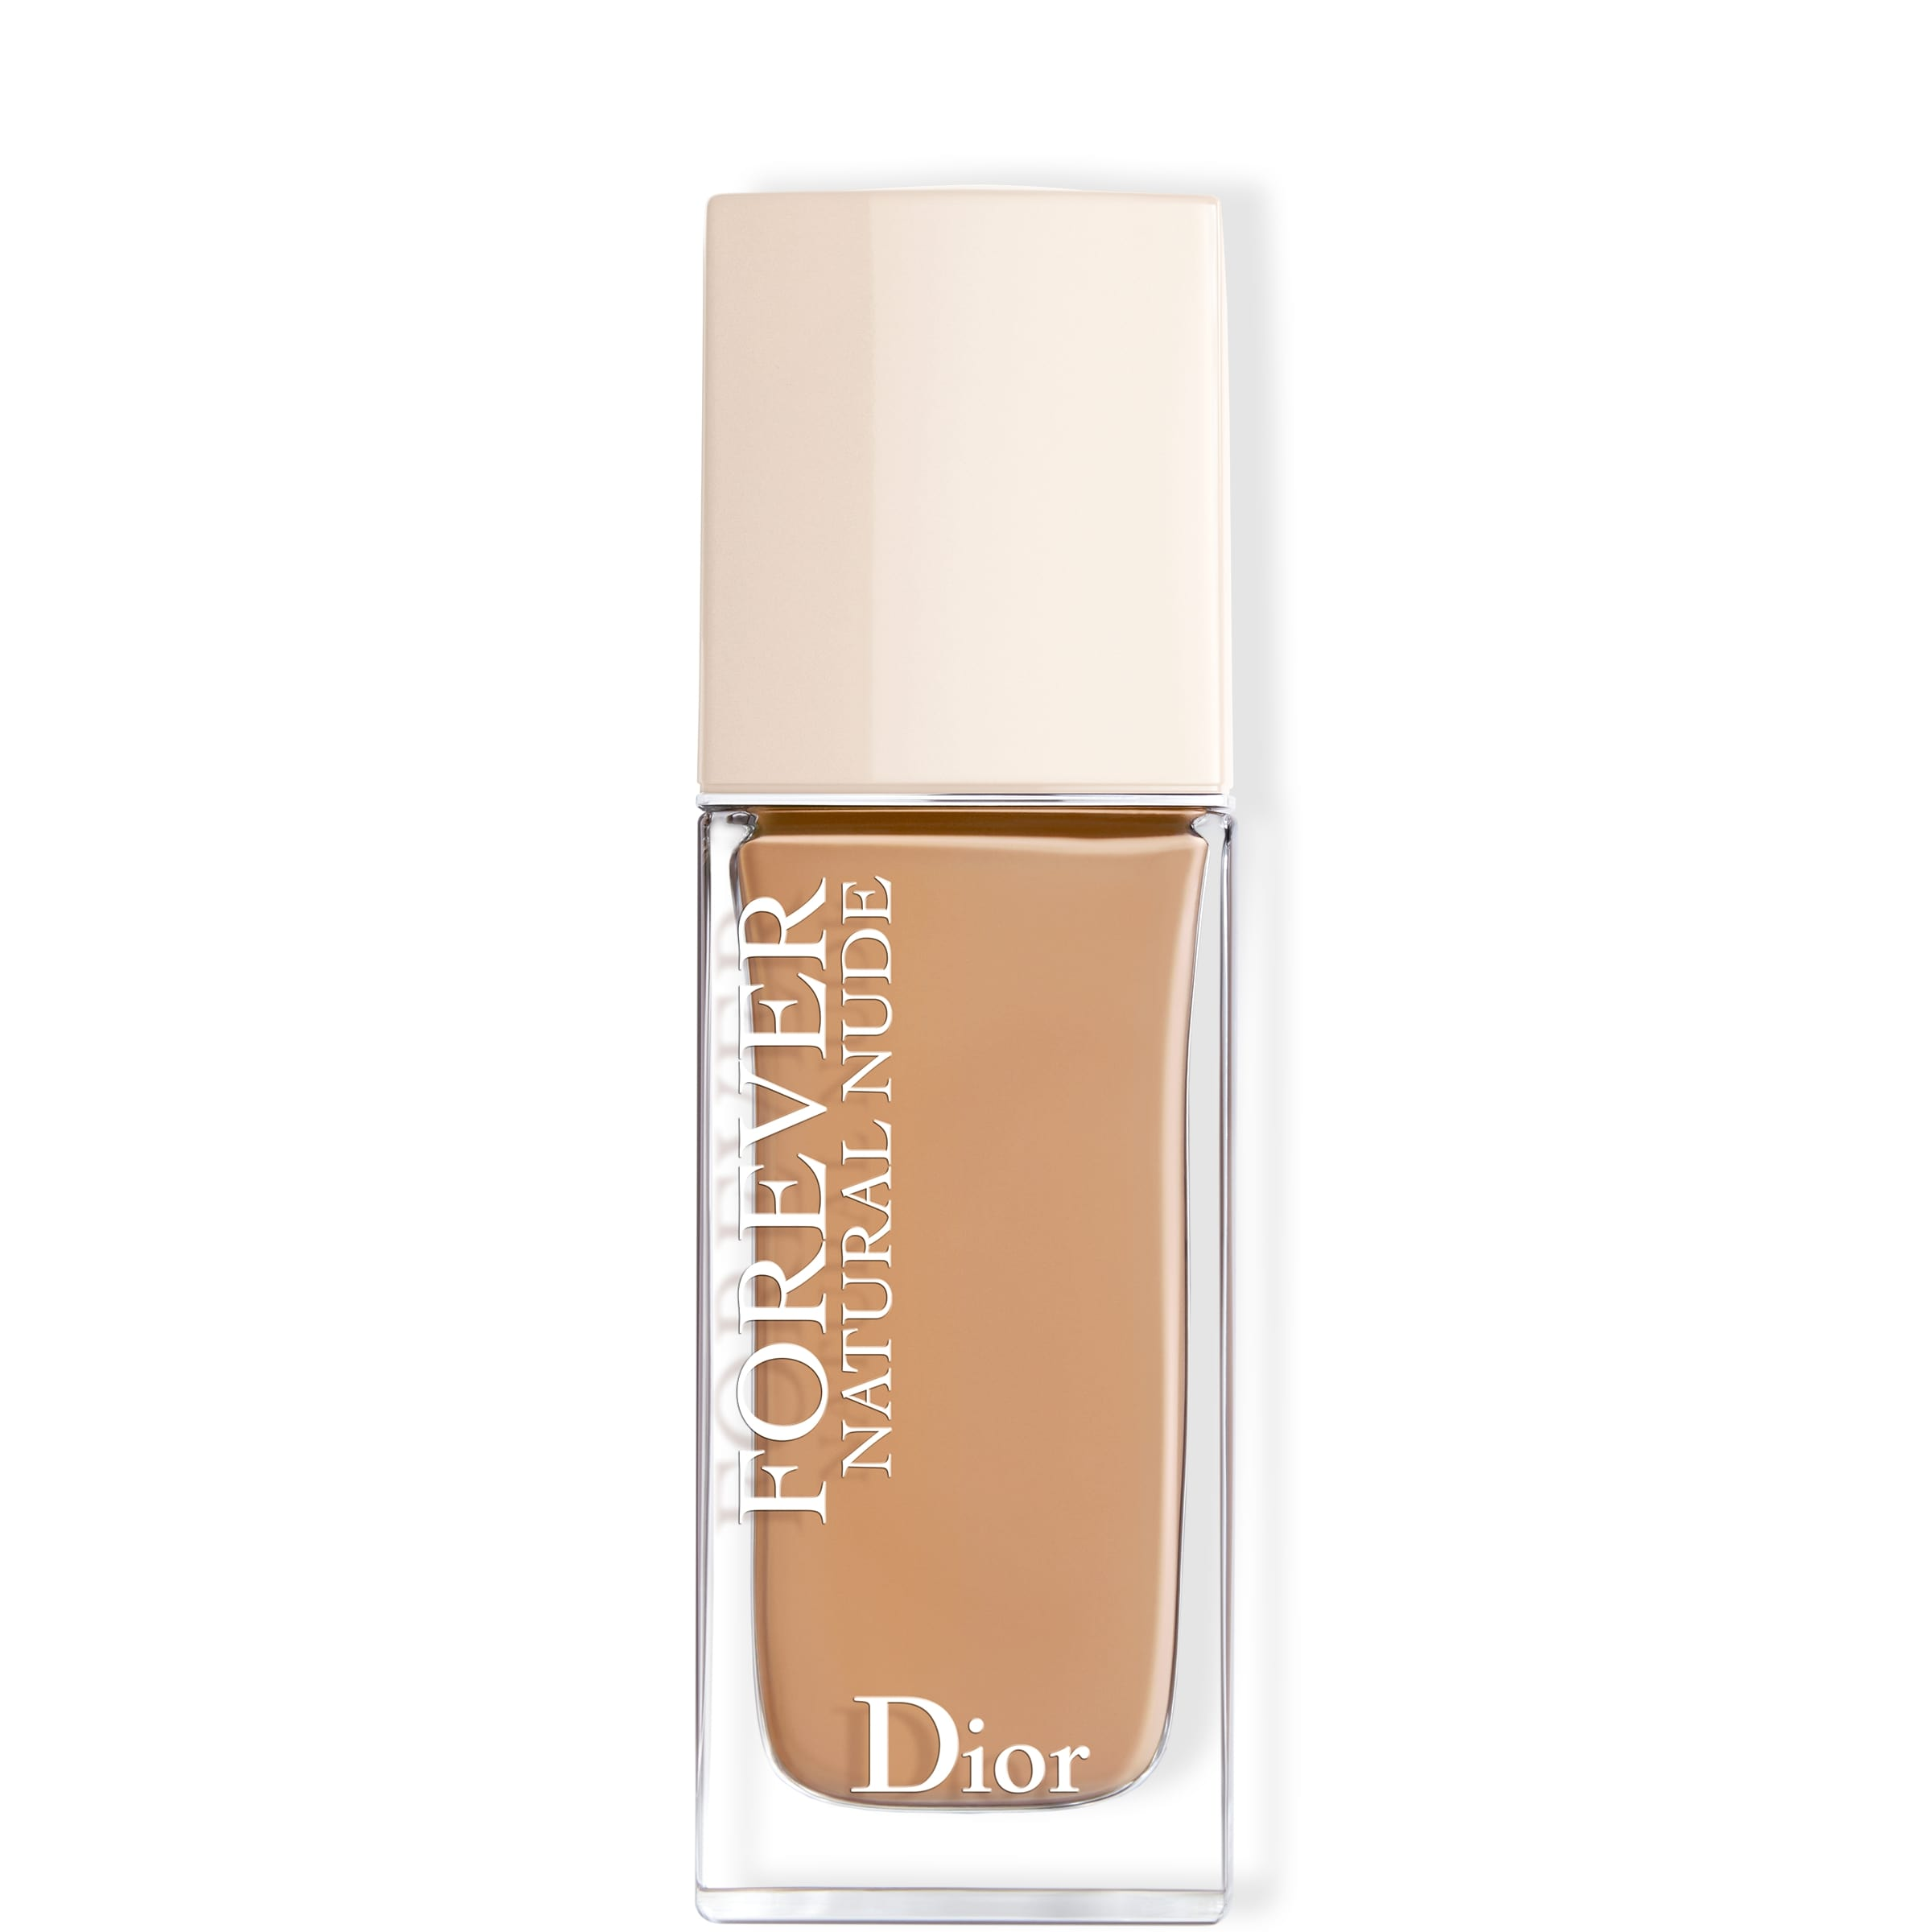 DIOR Forever Natural Nude Lightweight Foundation, 4N